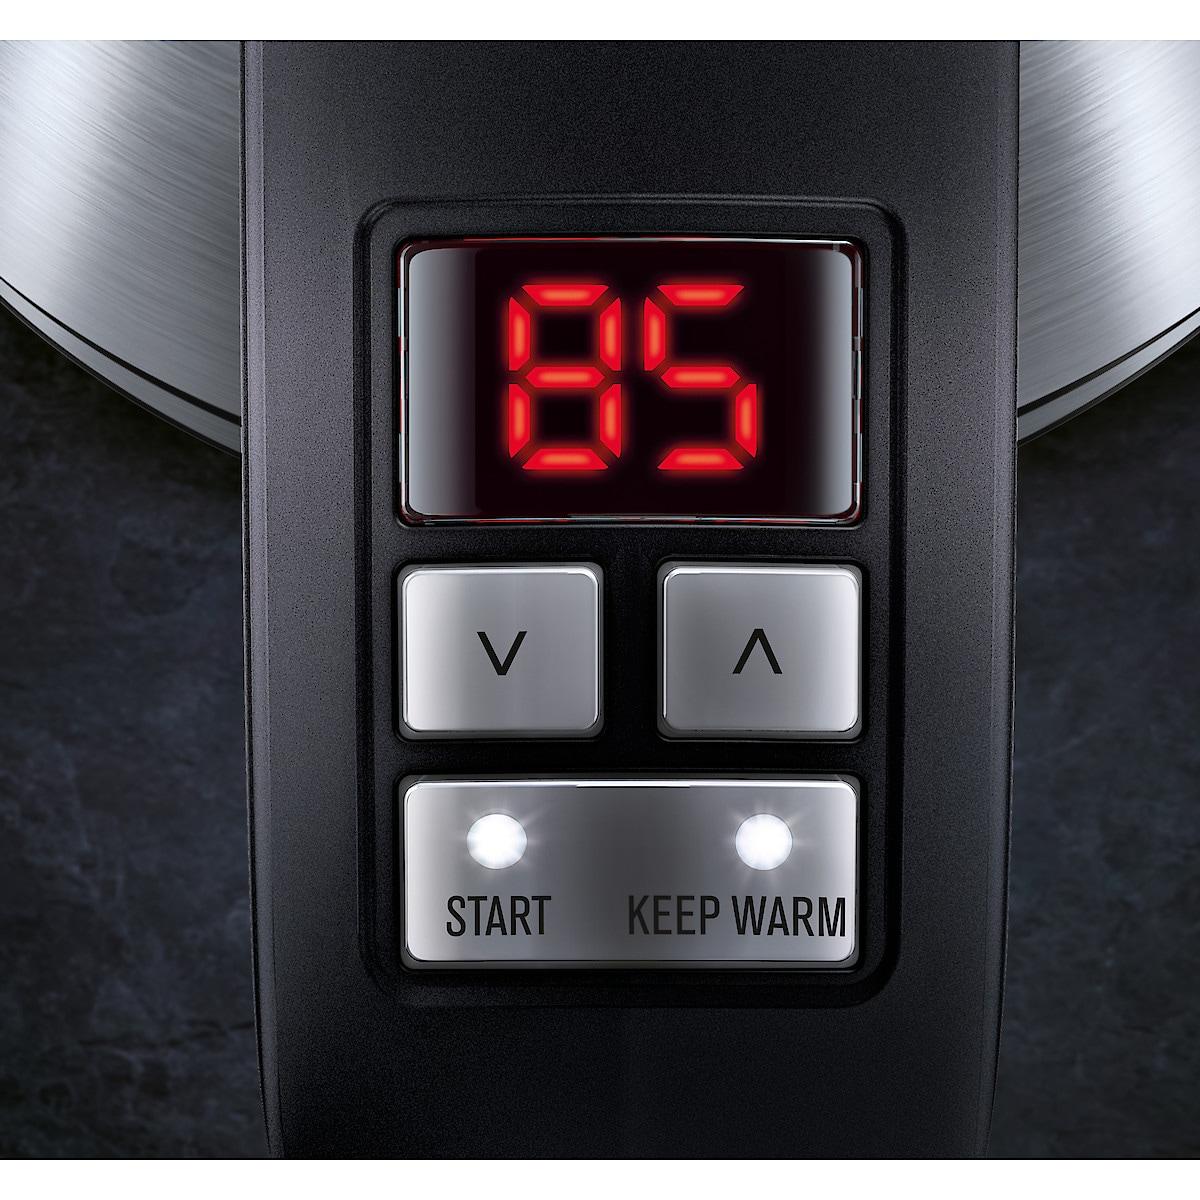 Electrolux EEWA7700, Vannkoker